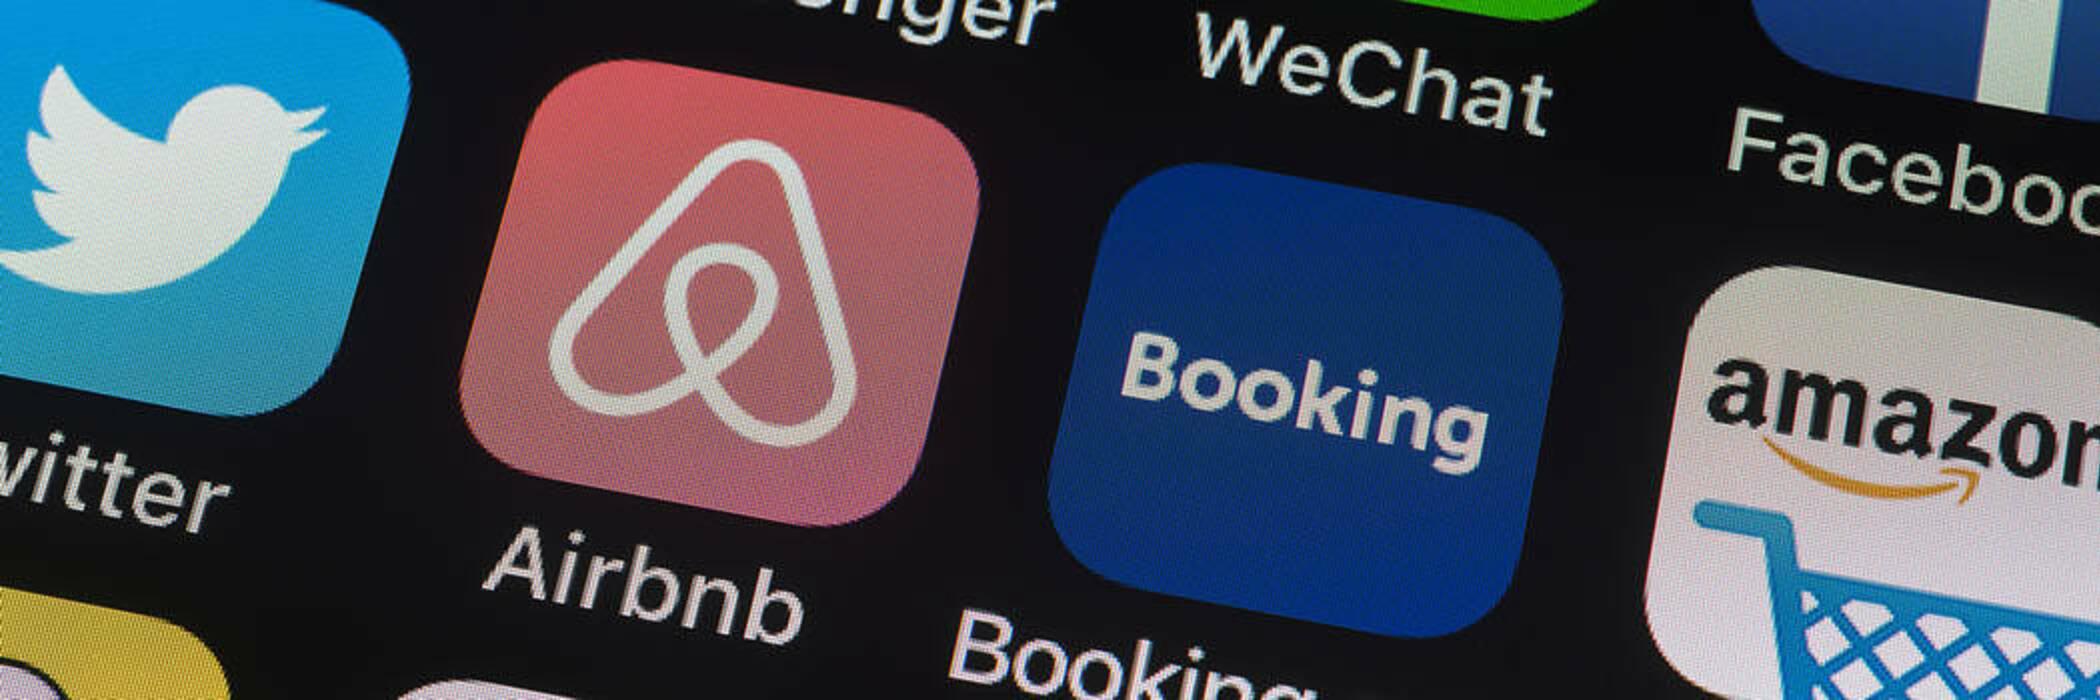 21mar airbnb customer wins hero